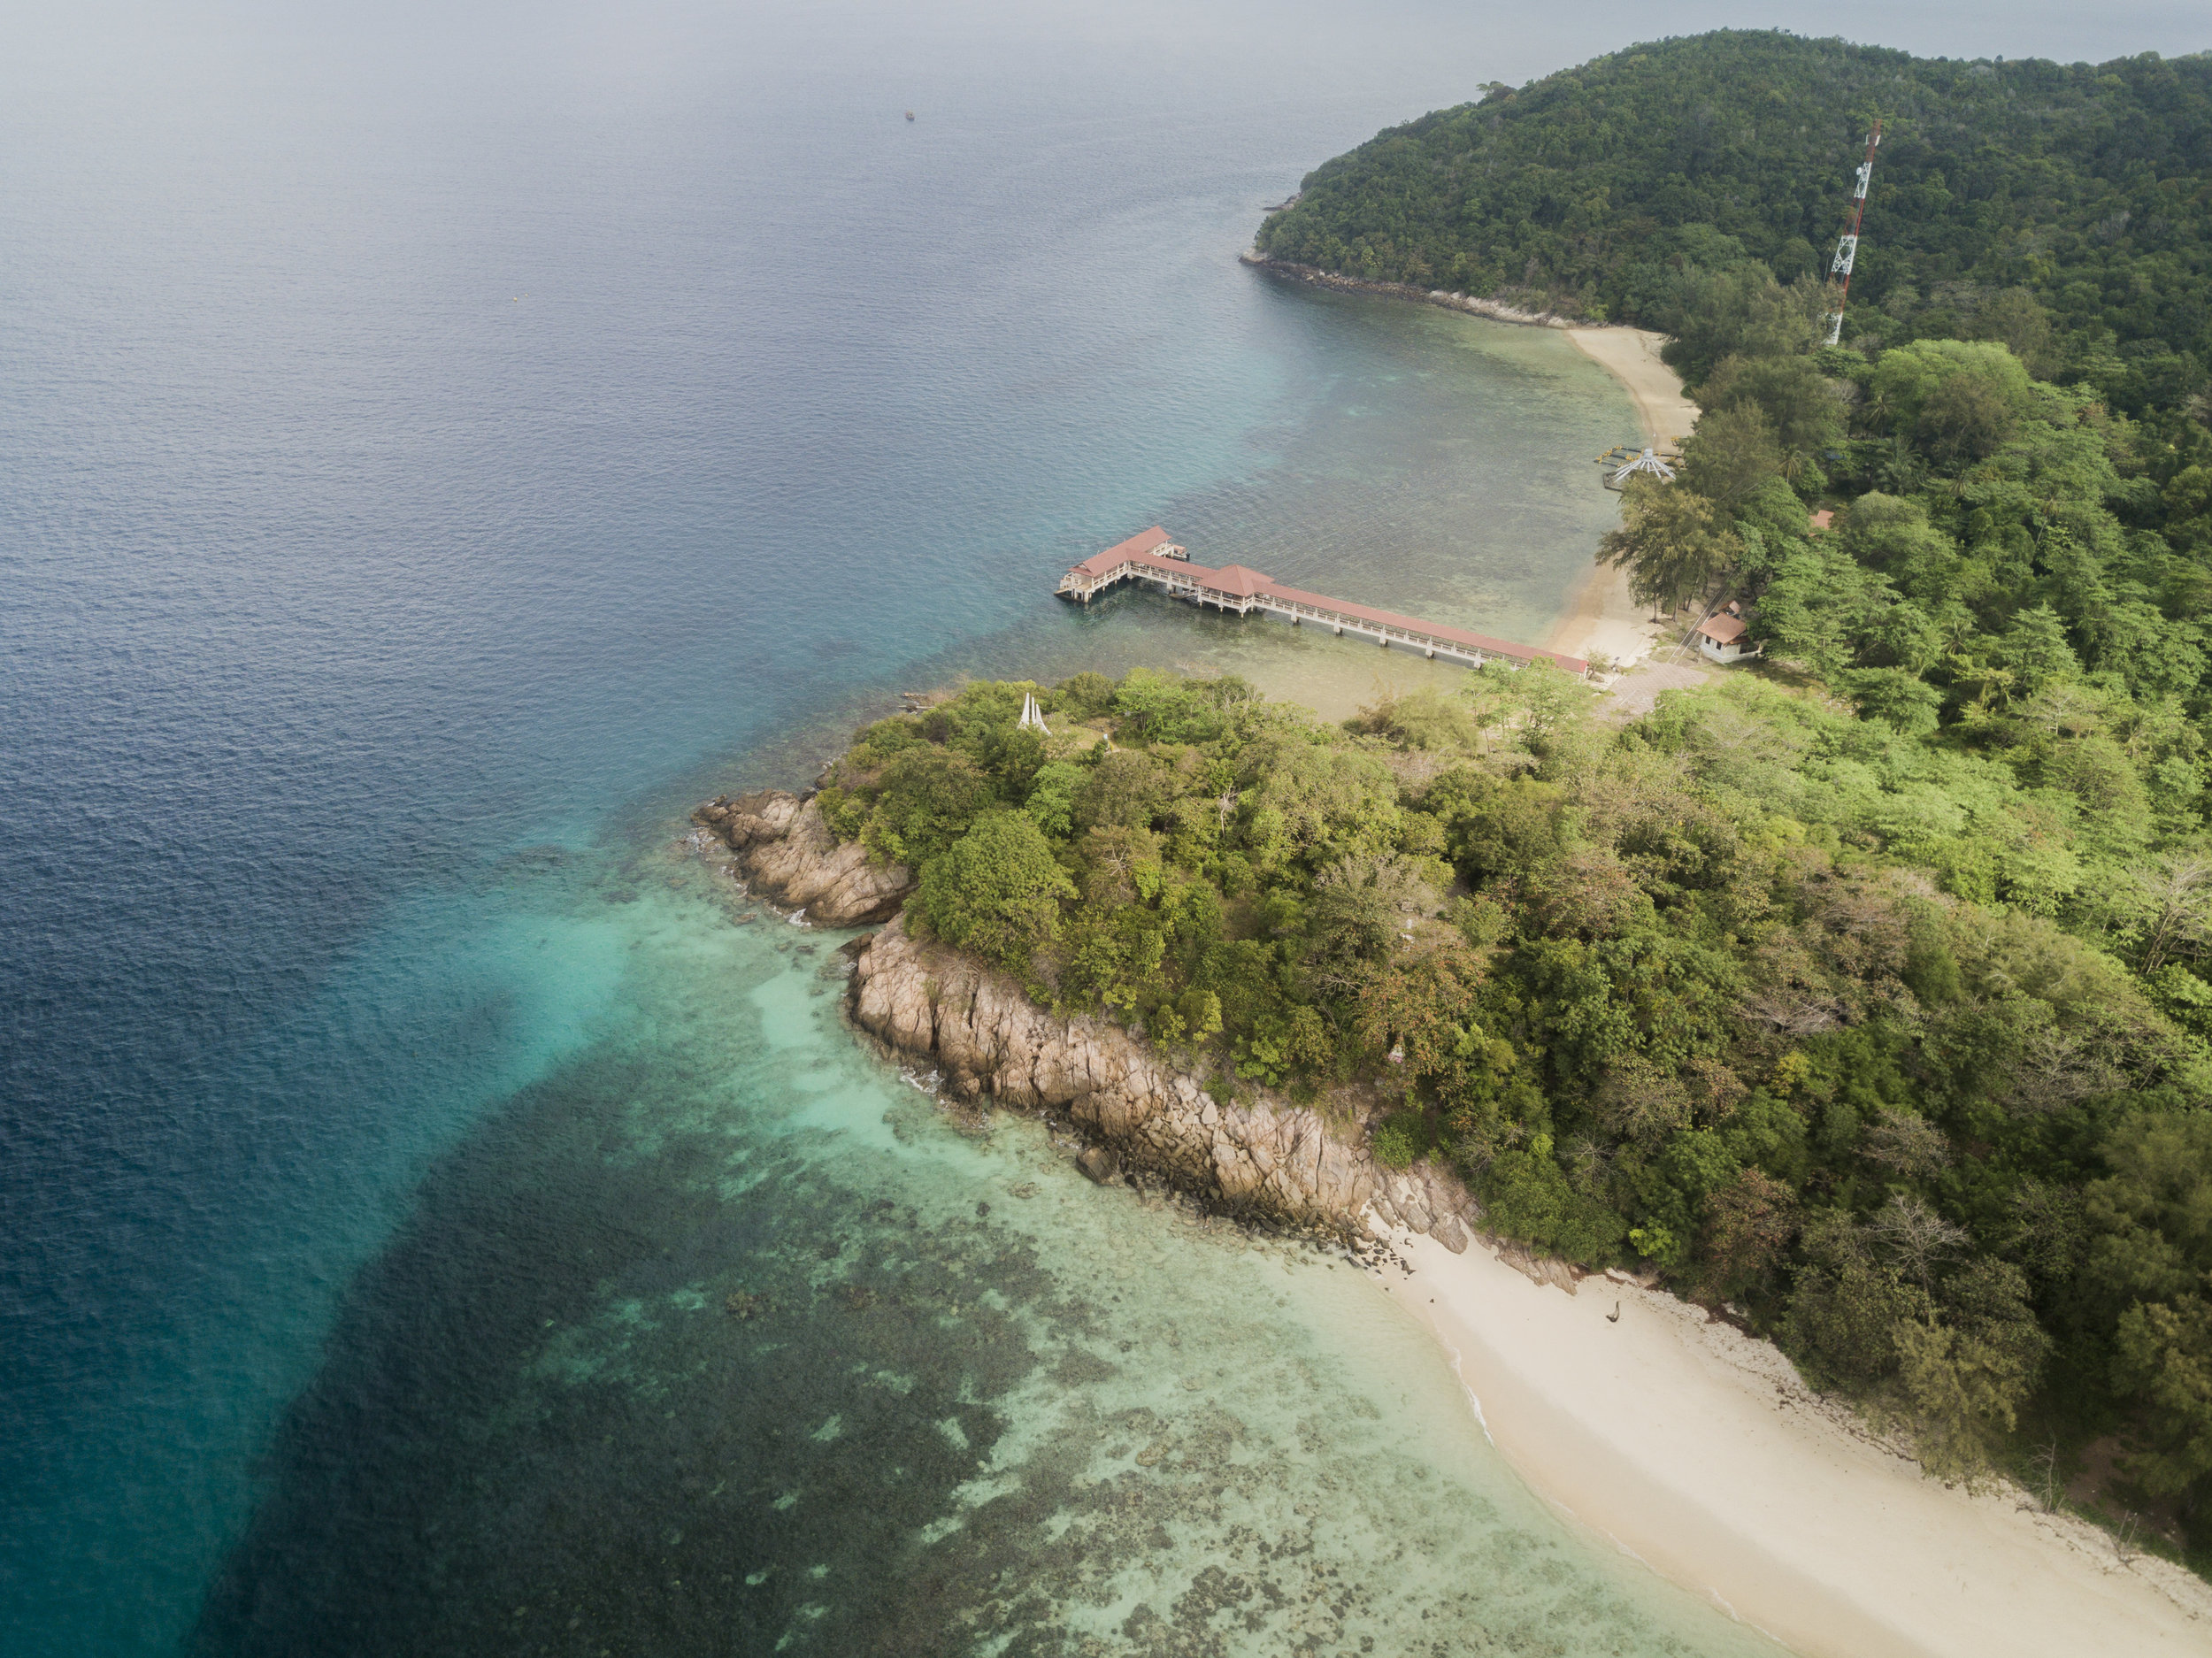 Pulau Bidong's empty beaches in 2018